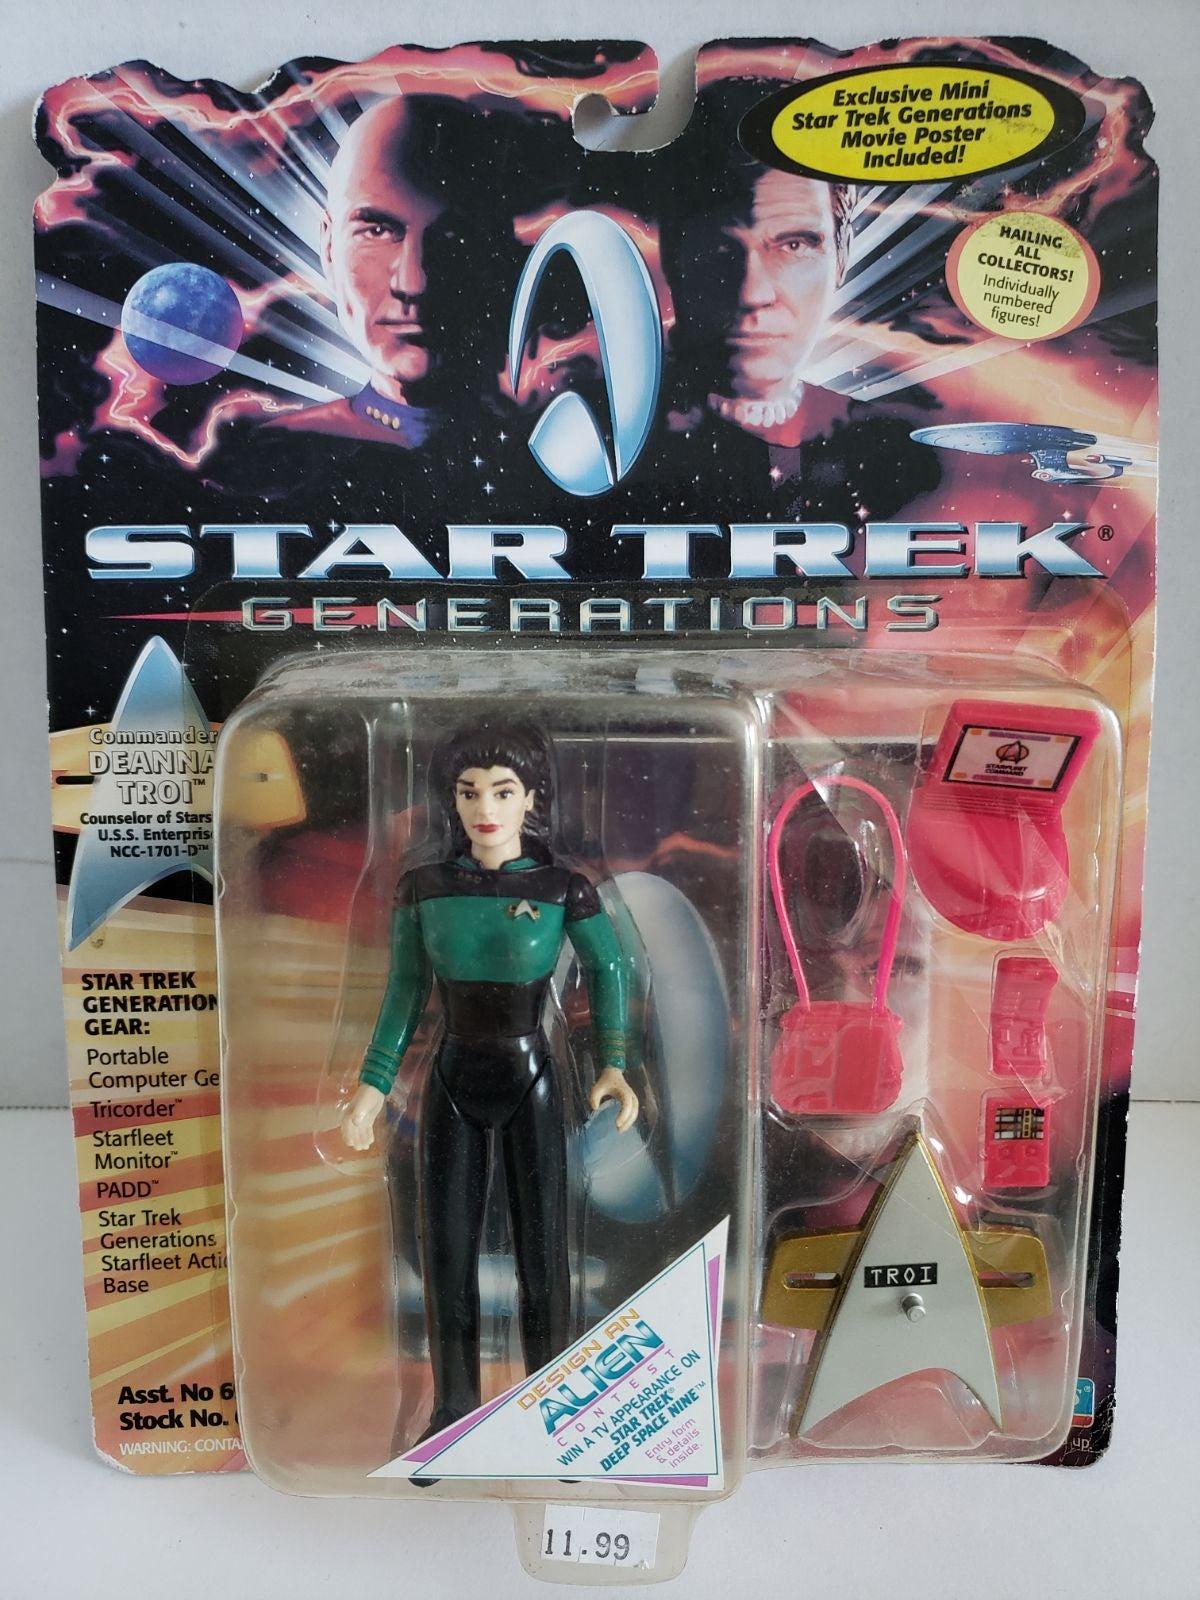 Star Trek Action Figure - Deanna Troi